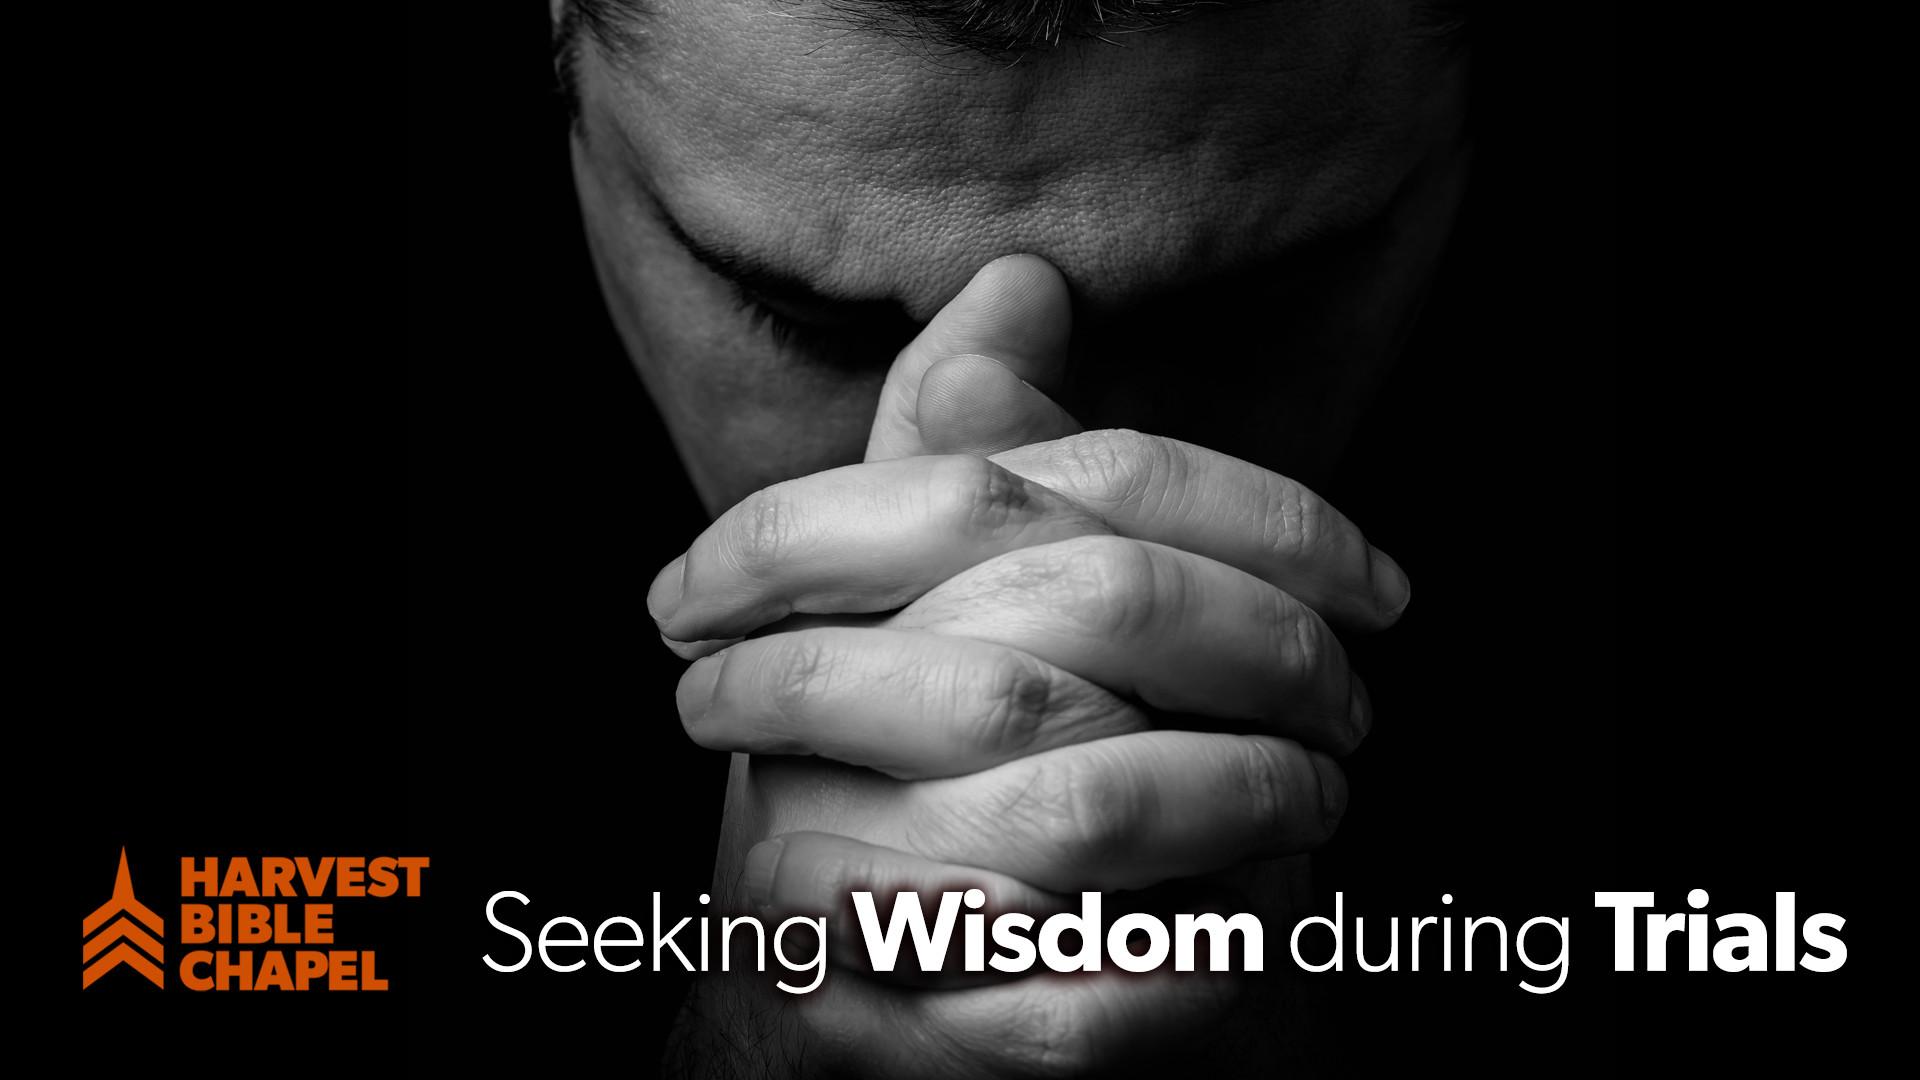 2018-JUL-GuestSpeakers_MikeWolski_Seeking Wisdom in Trials.jpg